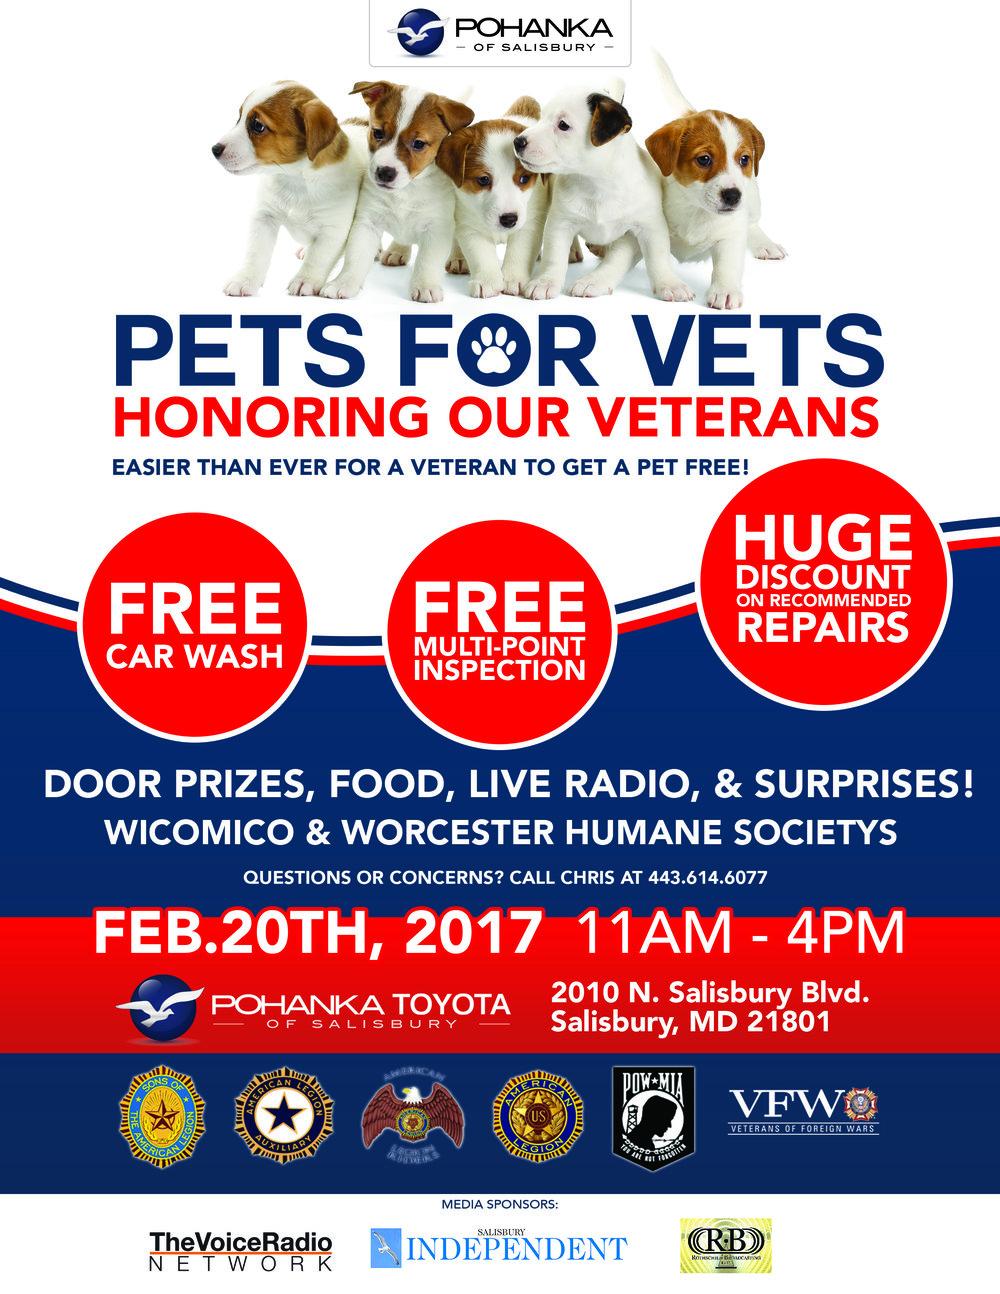 Pets-For-Vets-Flyer.jpg